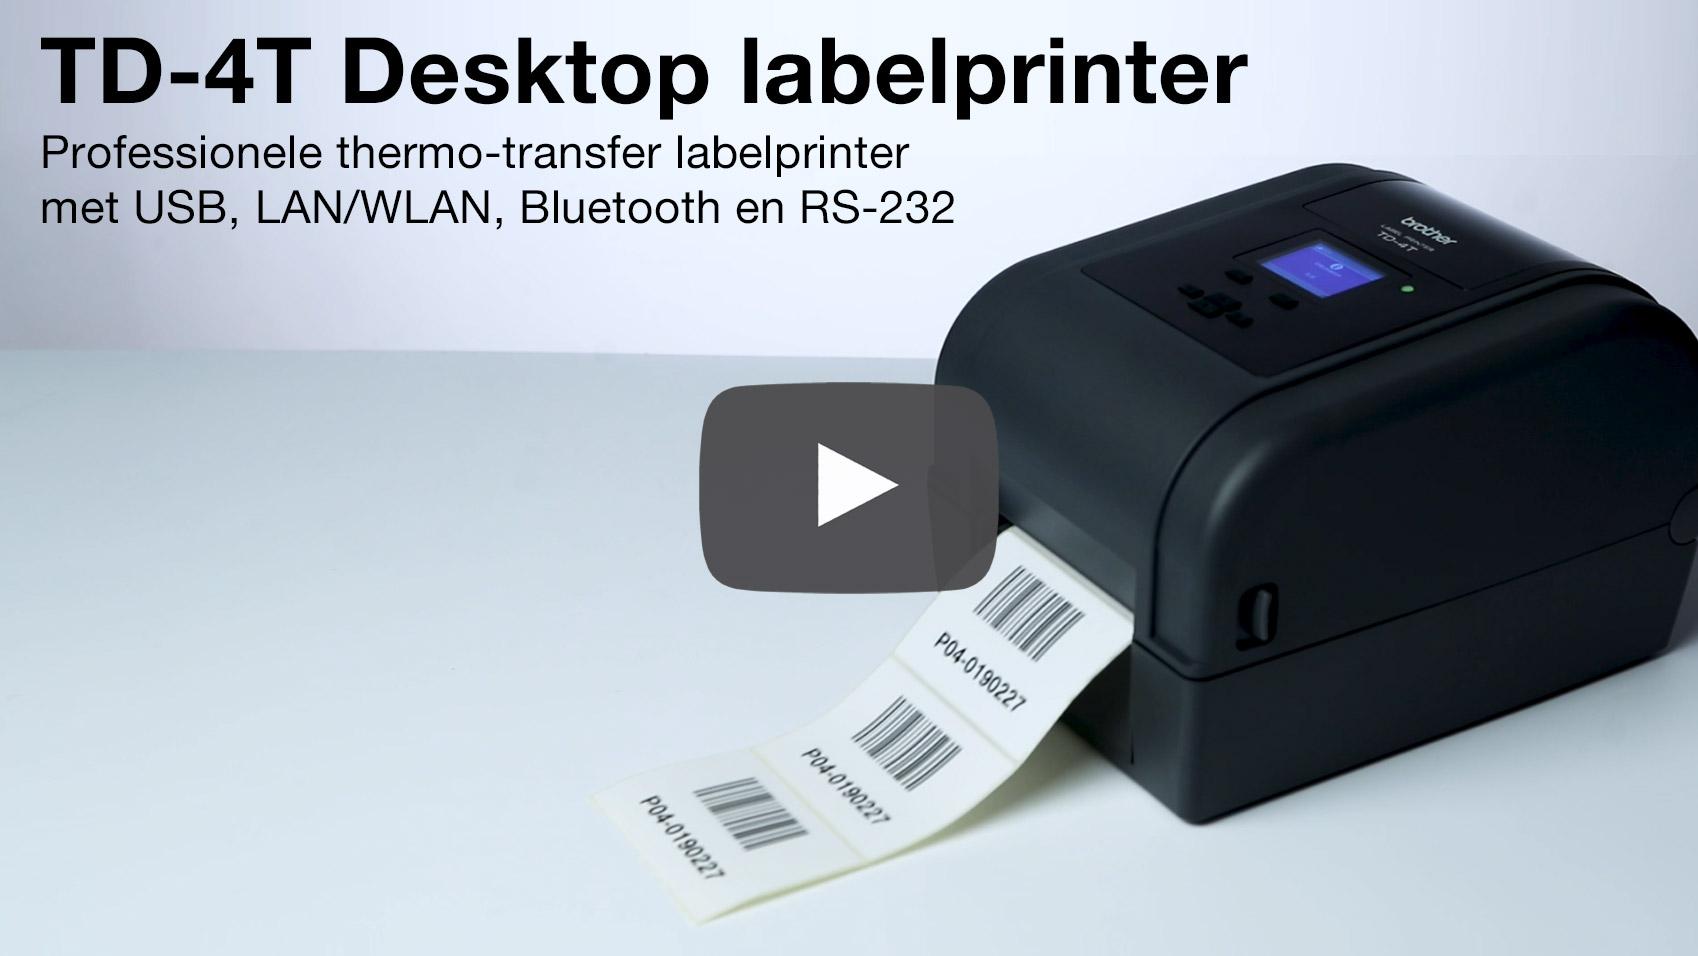 TD-4650TNWB Professionele thermo-transfer labelprinter met bekabelde/draadloze netwerkverbinding en Bluetooth 6